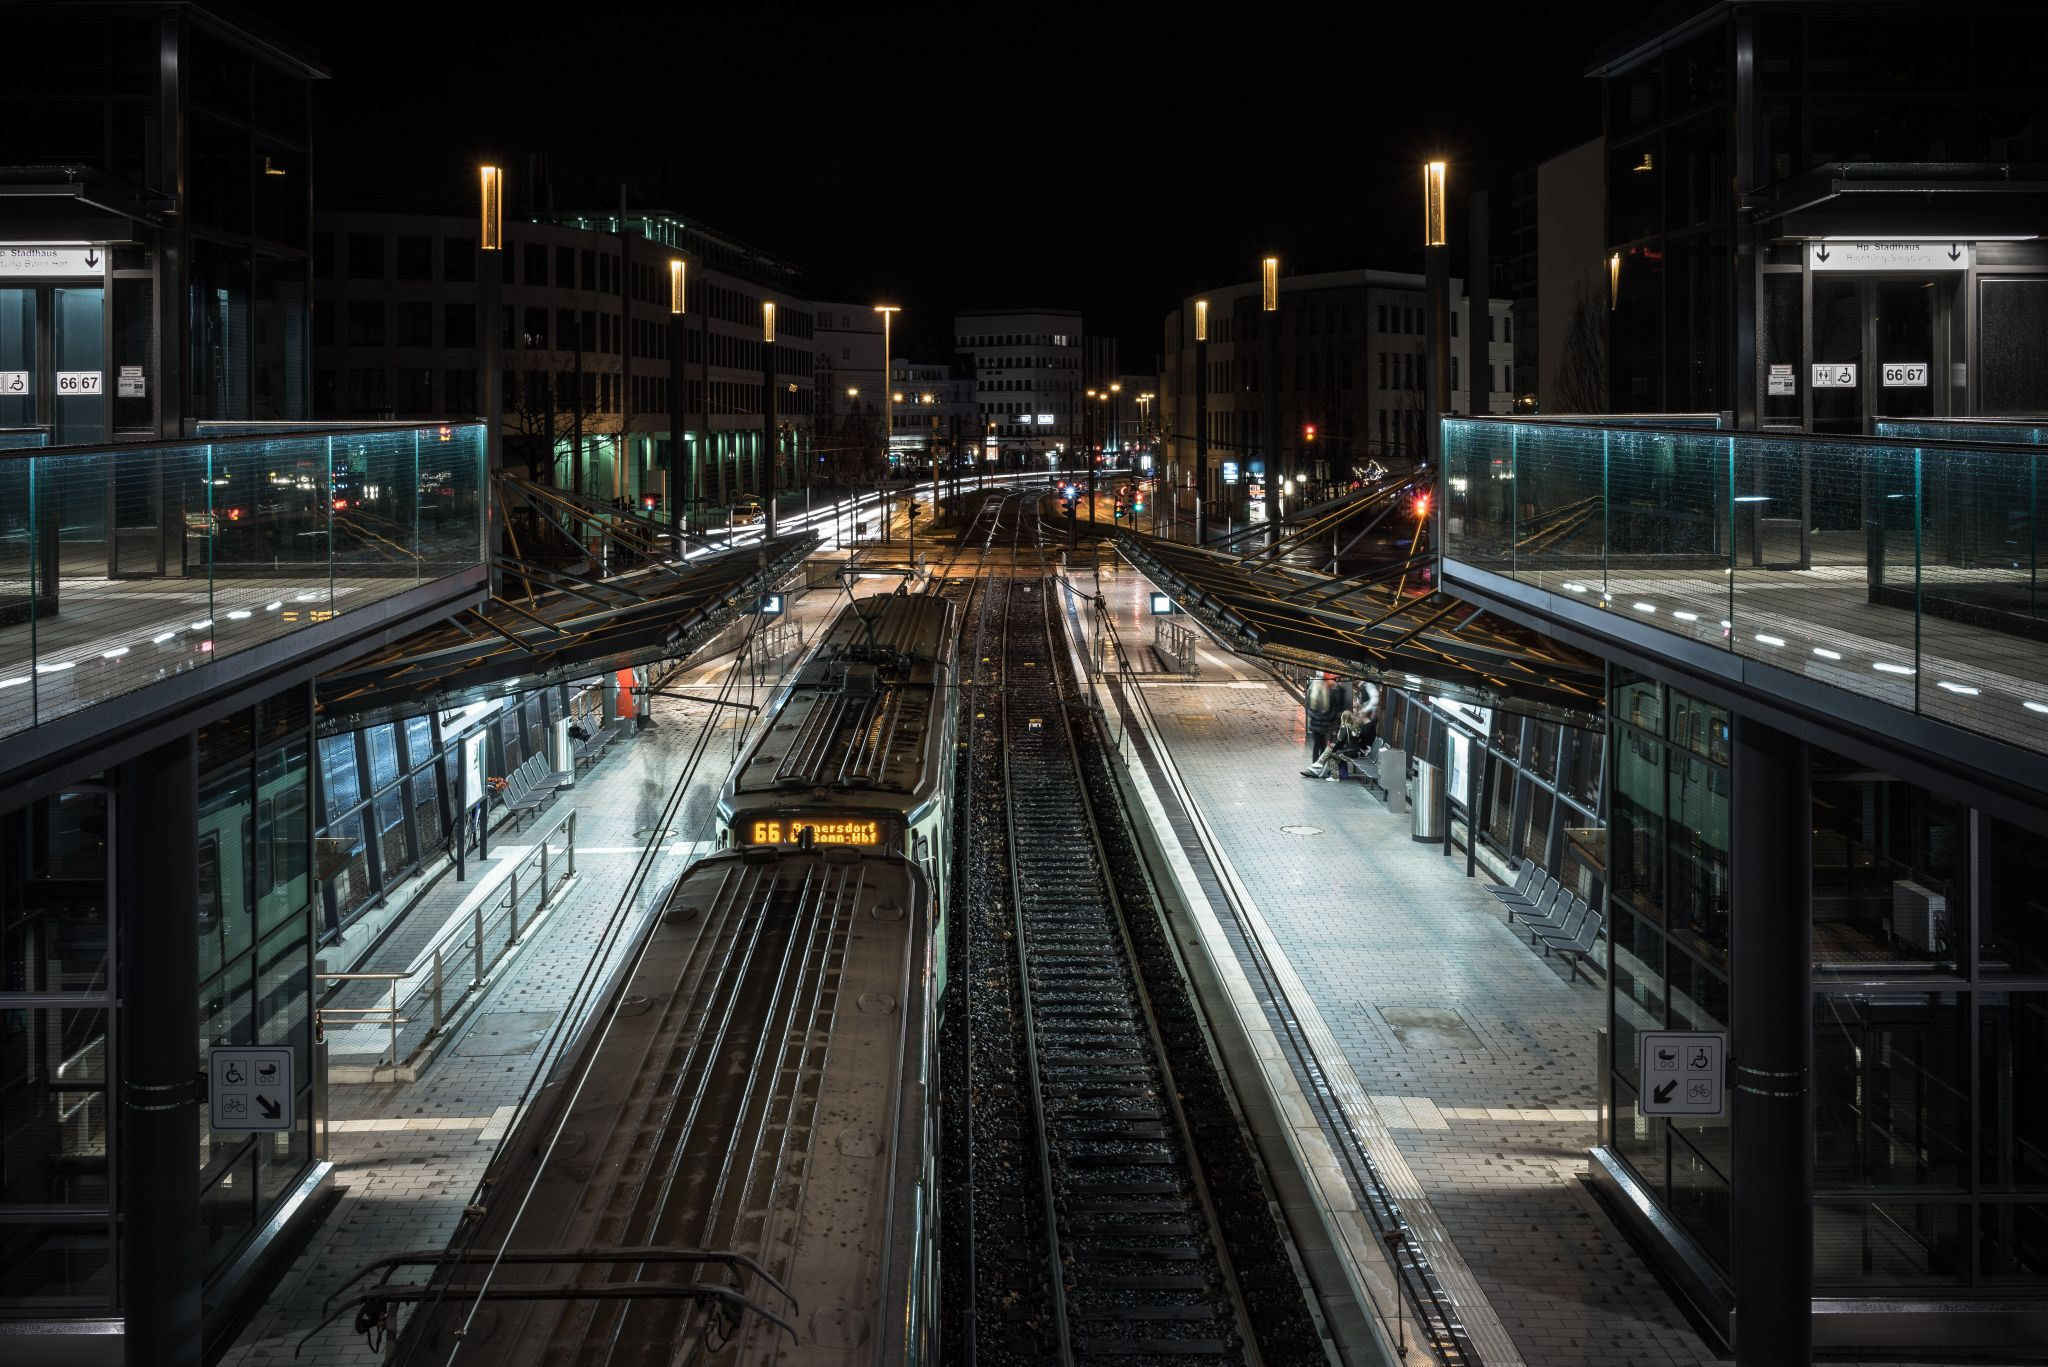 Stadthaus Station, Germany